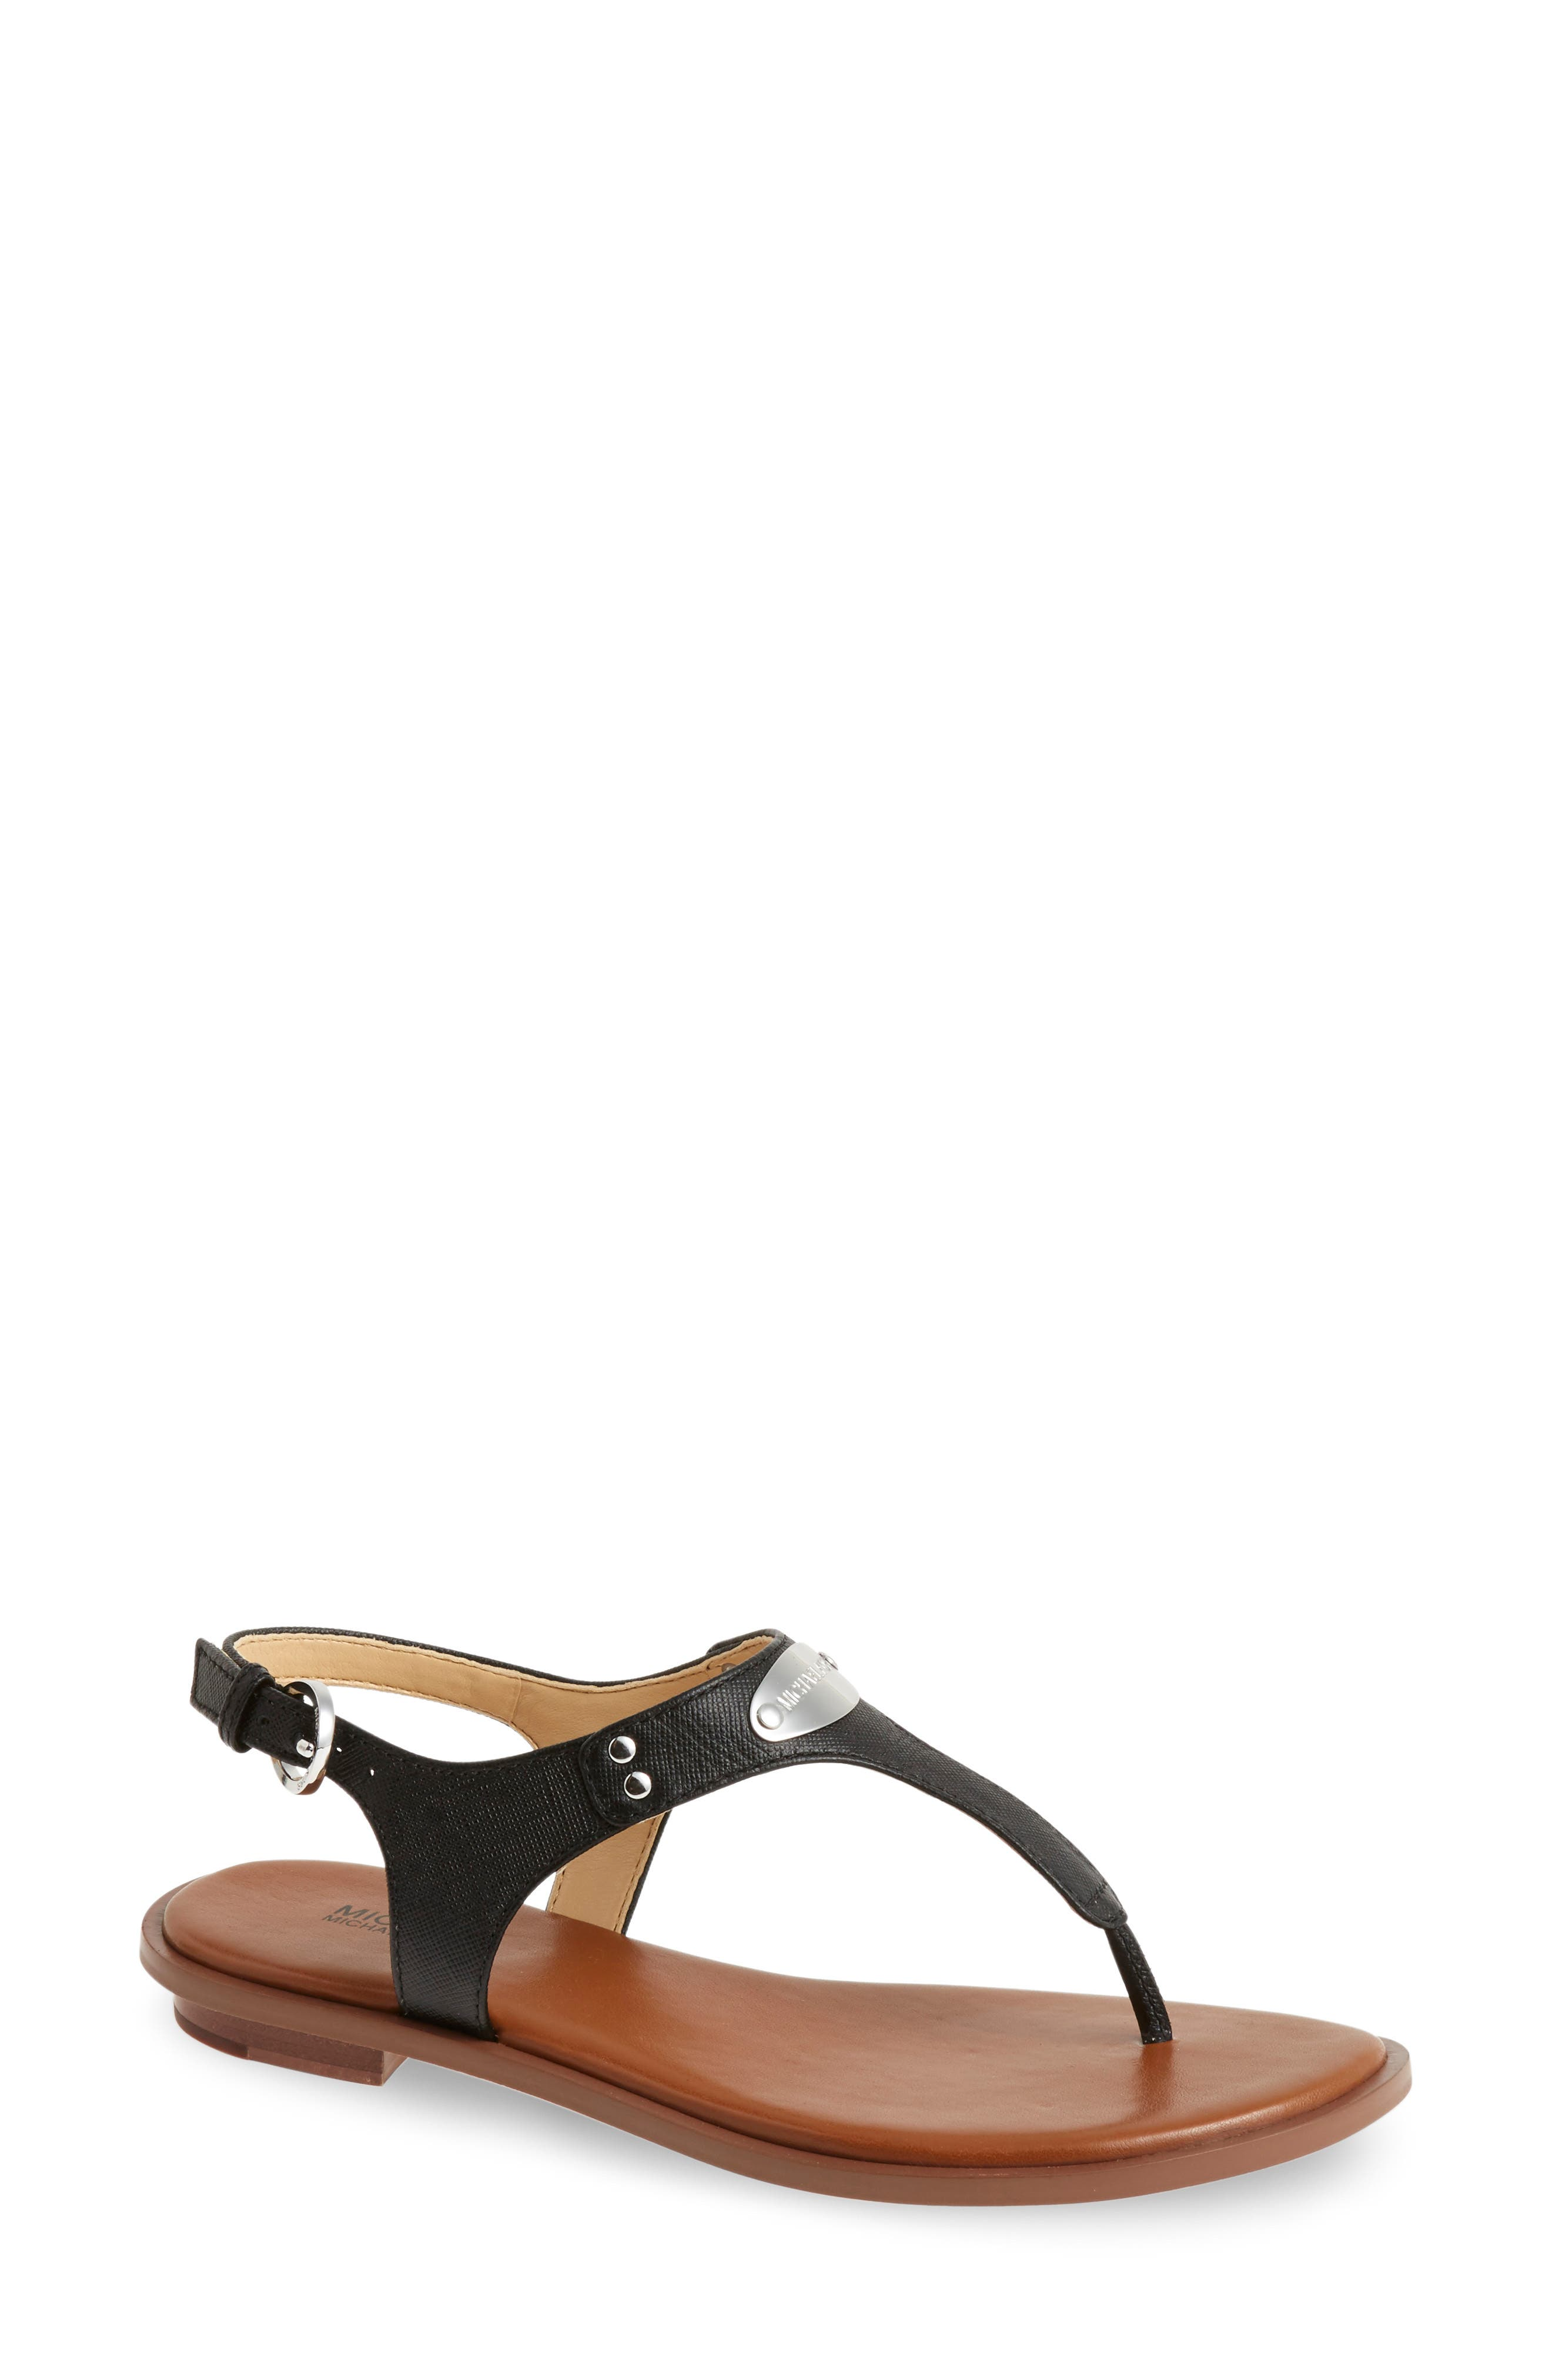 MICHAEL MICHAEL KORS, 'Plate' Sandal, Alternate thumbnail 4, color, BLACK